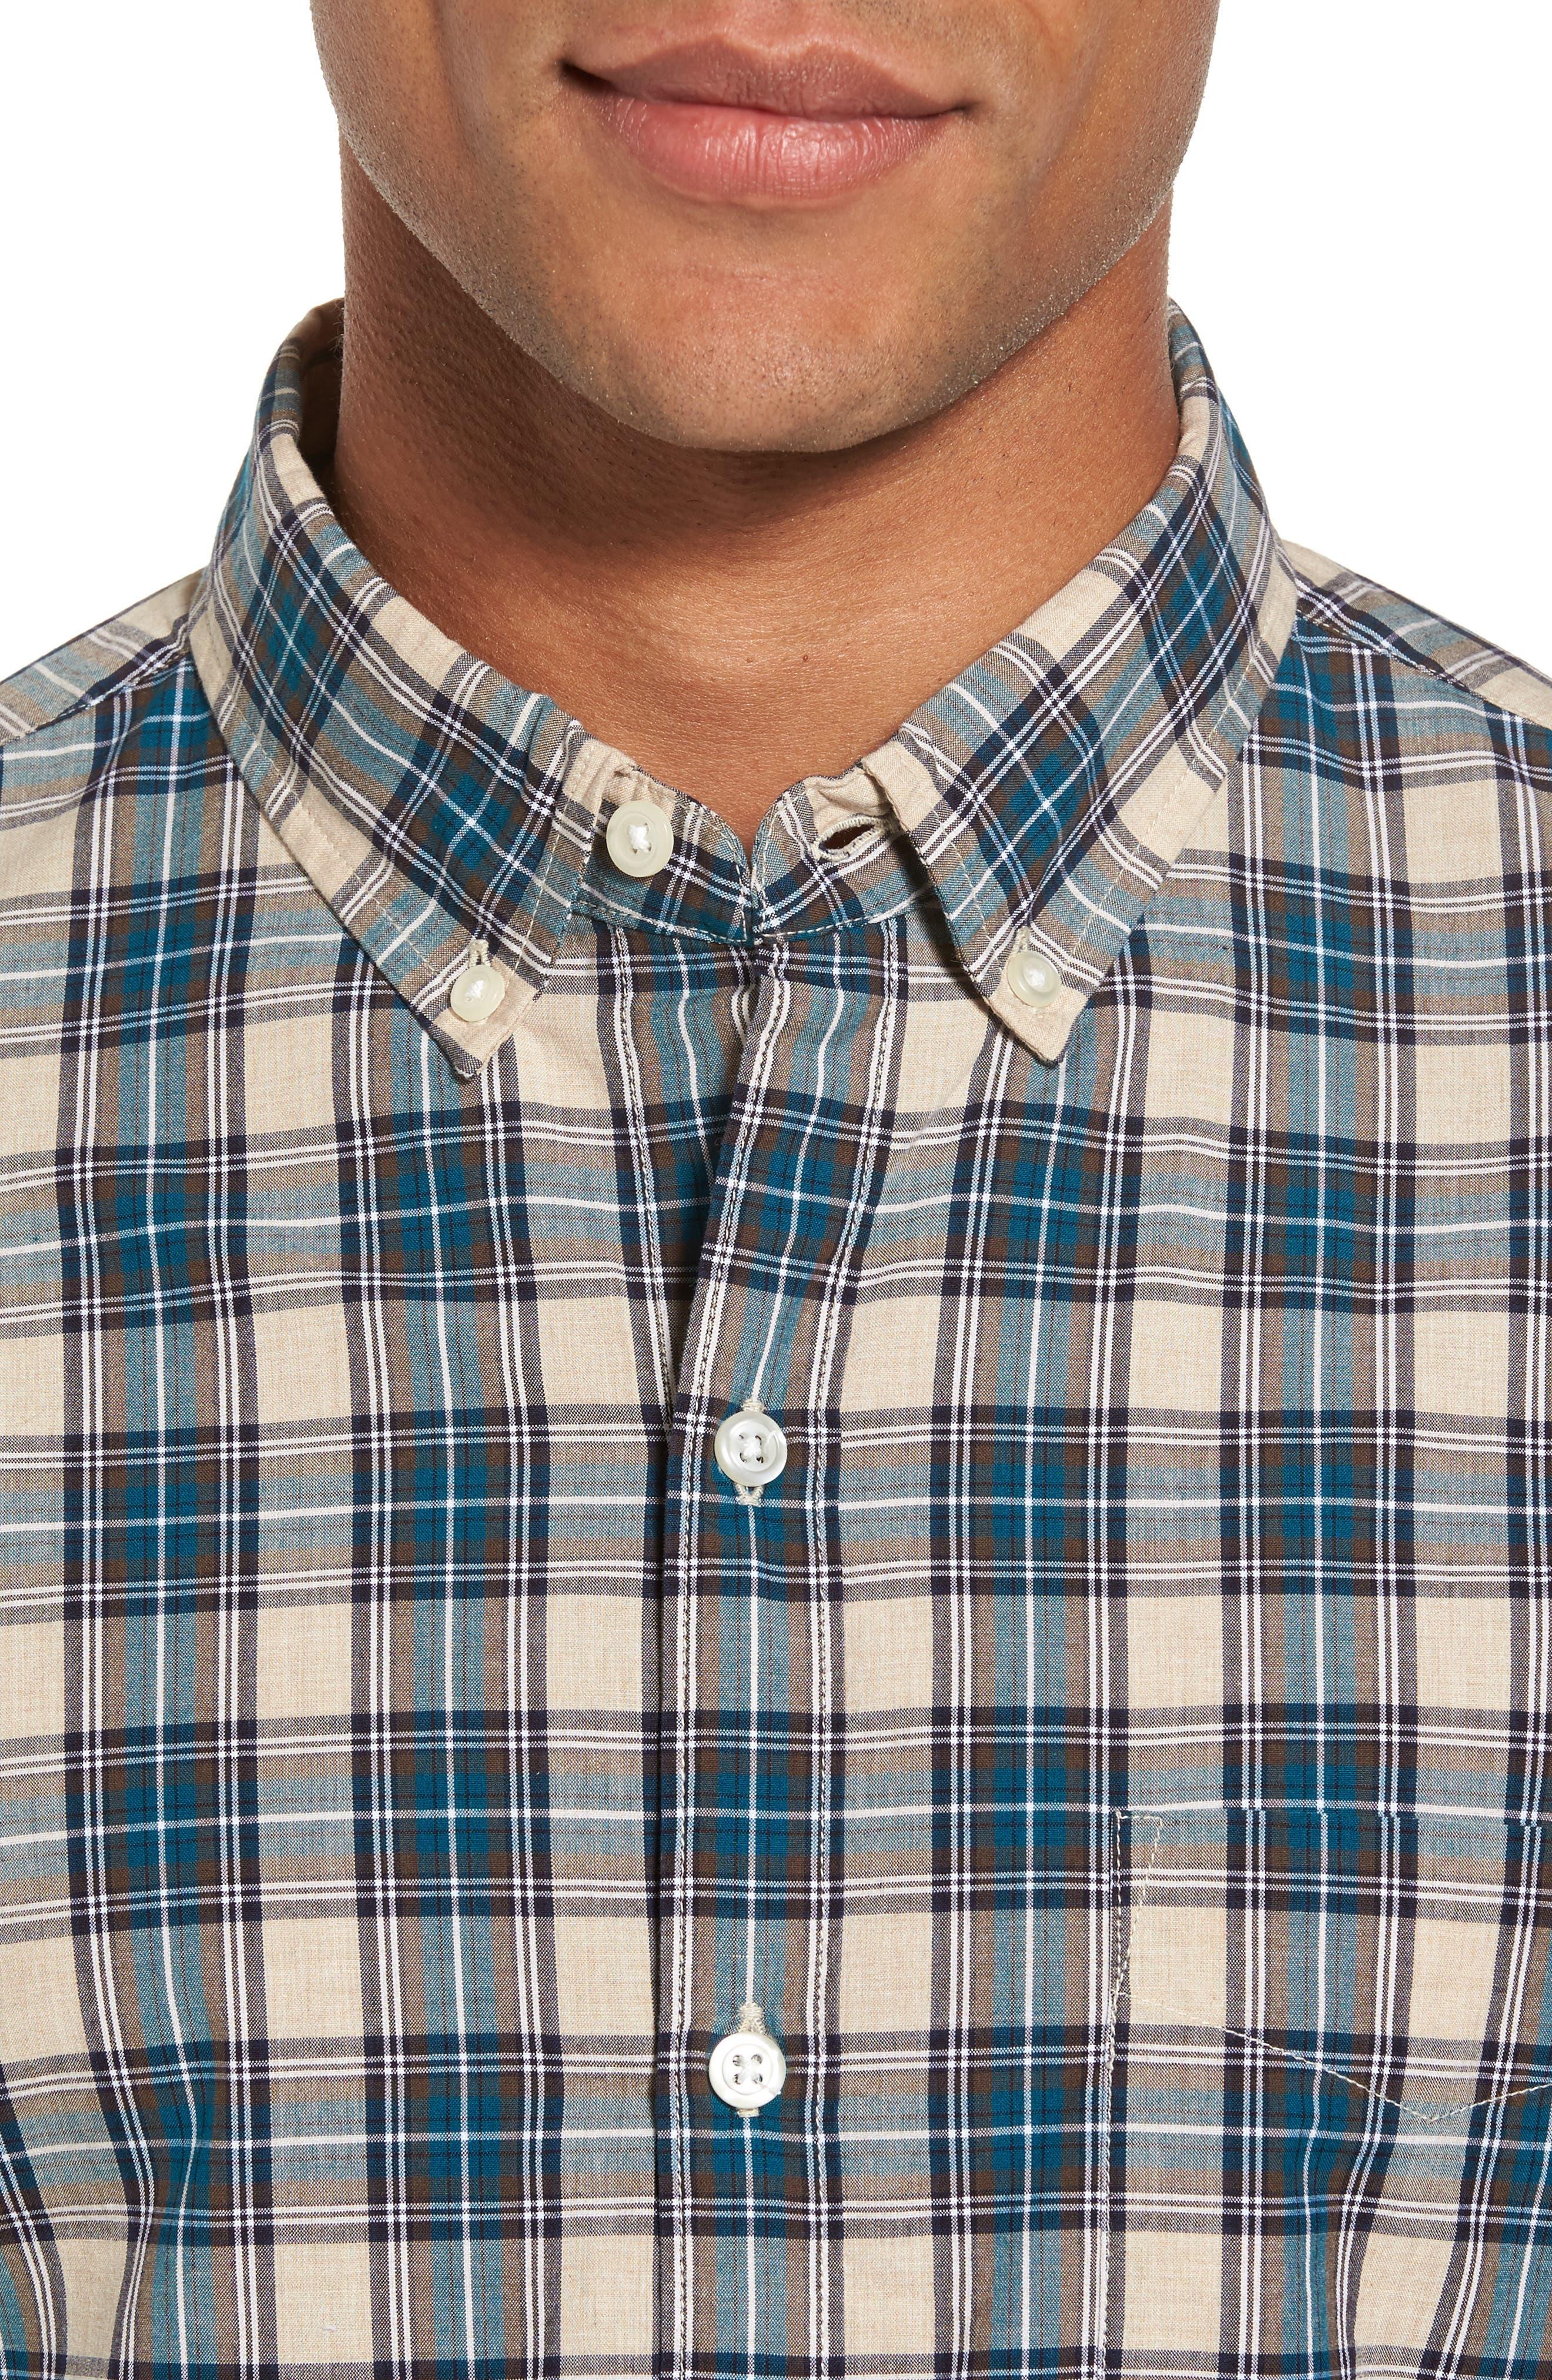 Washed Slim Fit Plaid Sport Shirt,                             Alternate thumbnail 4, color,                             Blue Plaid